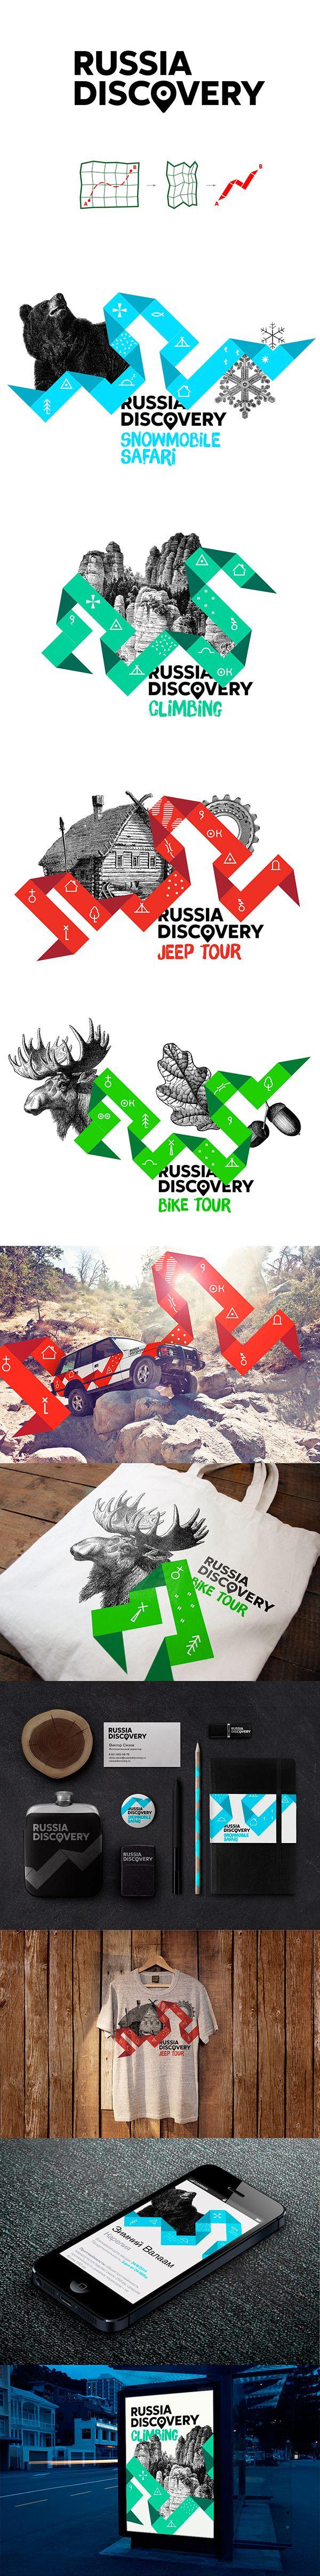 Ivan Burmistrov – Russia Discovery